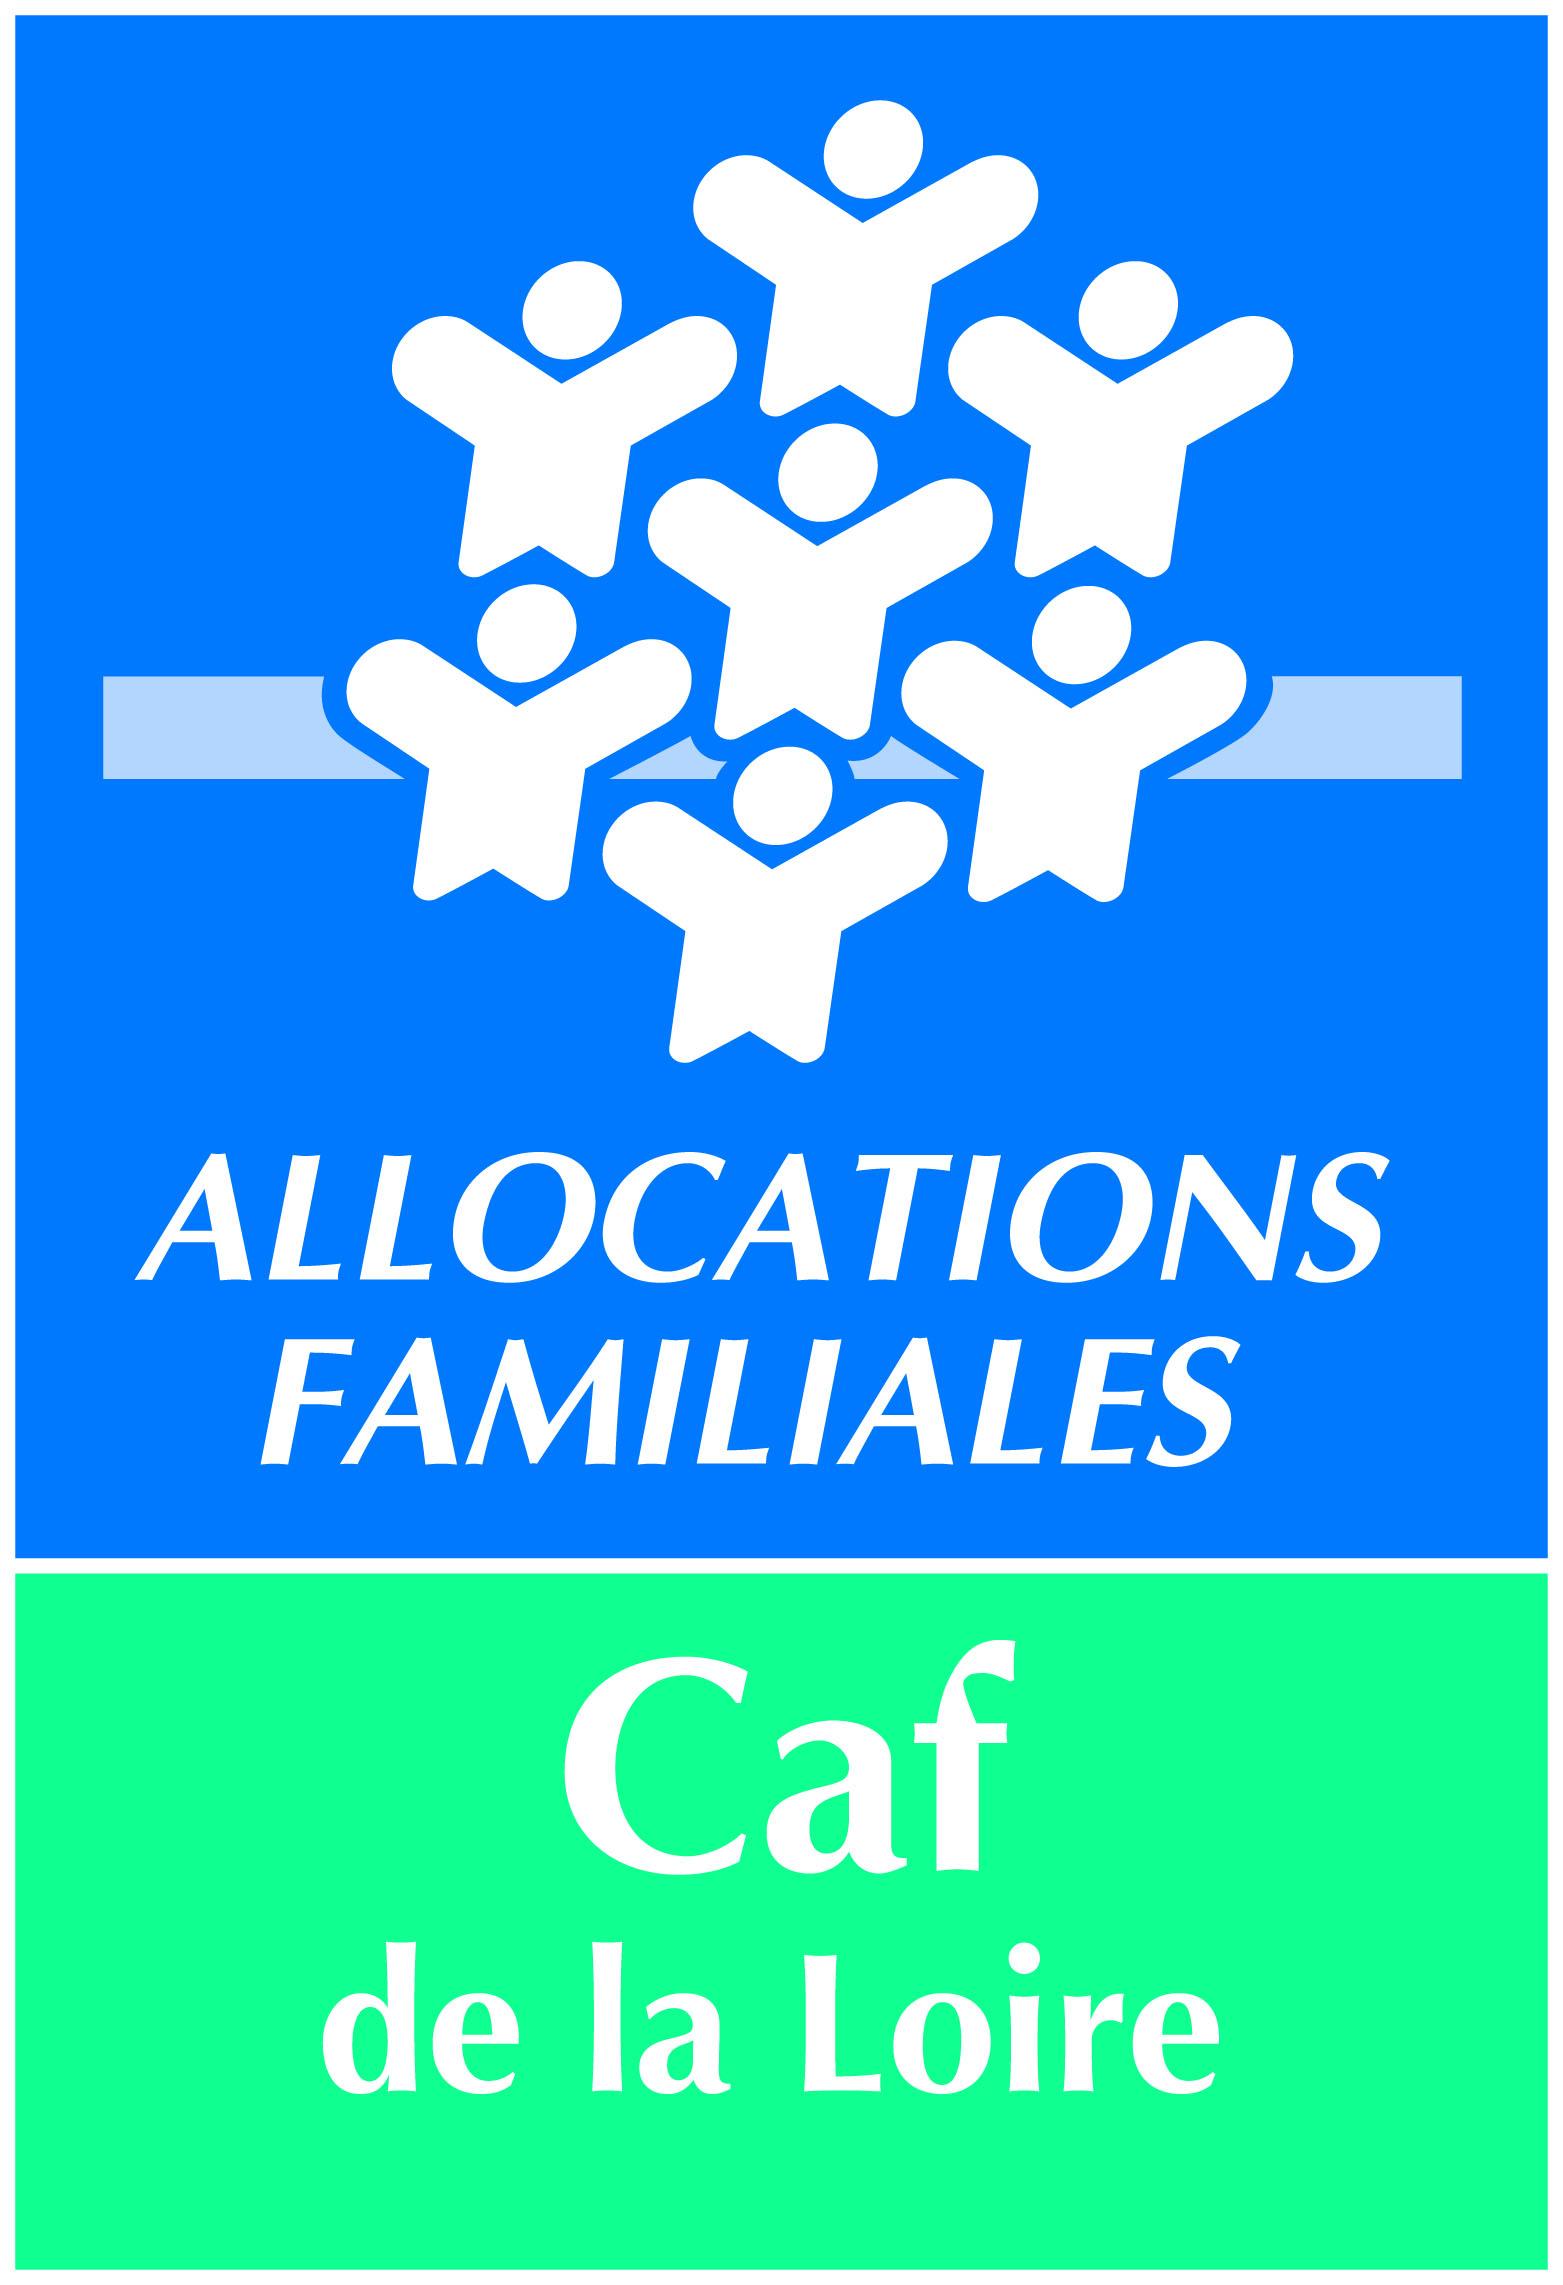 CAF de la Loire